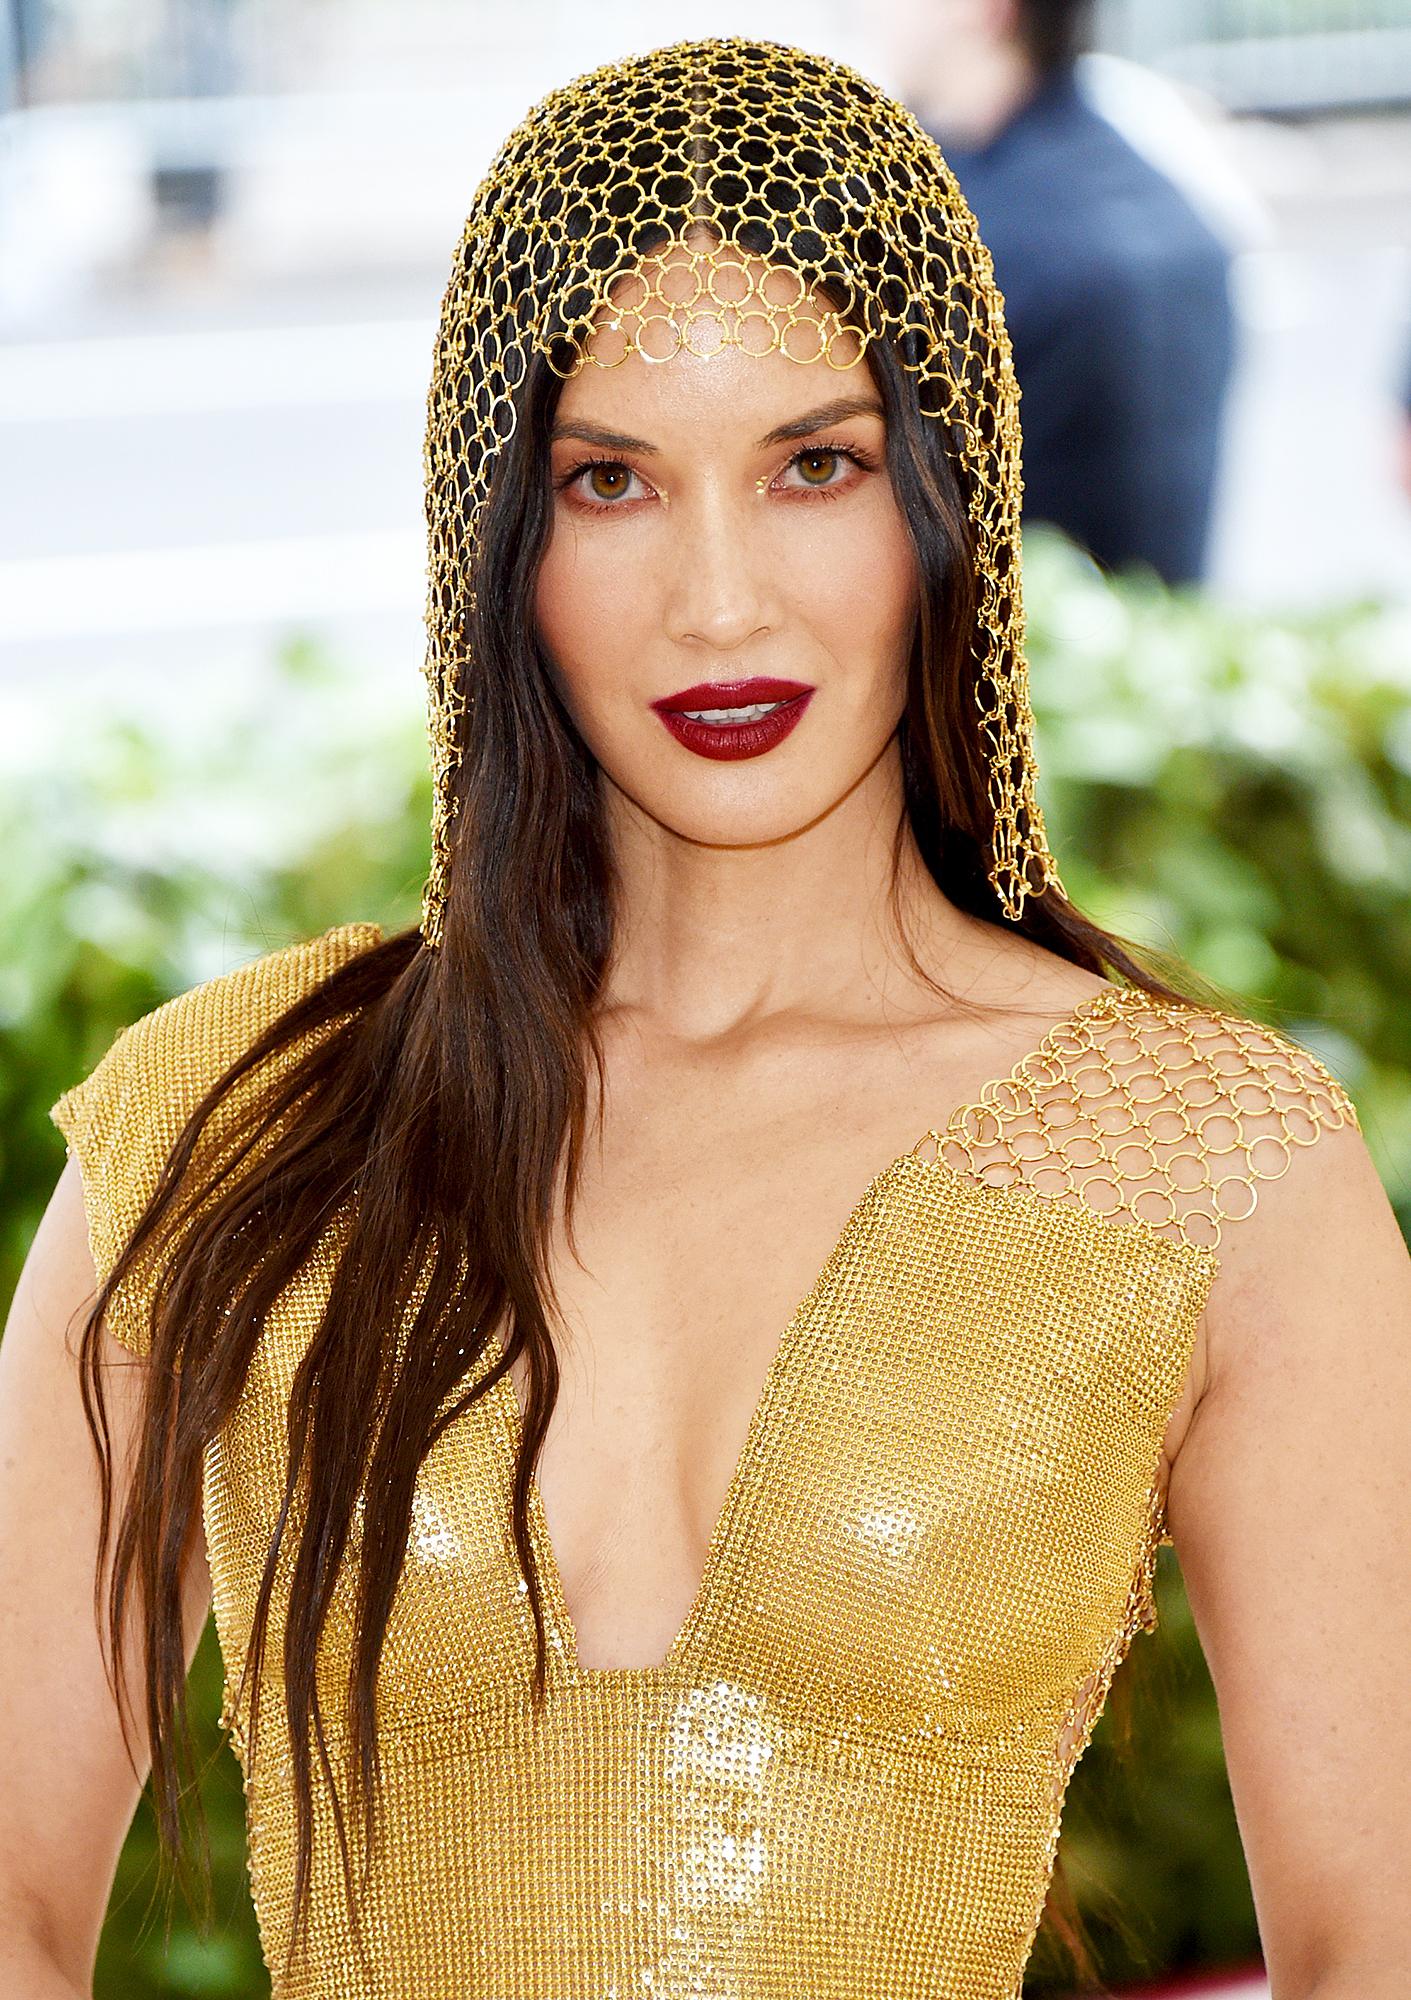 olivia-munn-met-gala-2018-wildest-hair-makeup.jpg